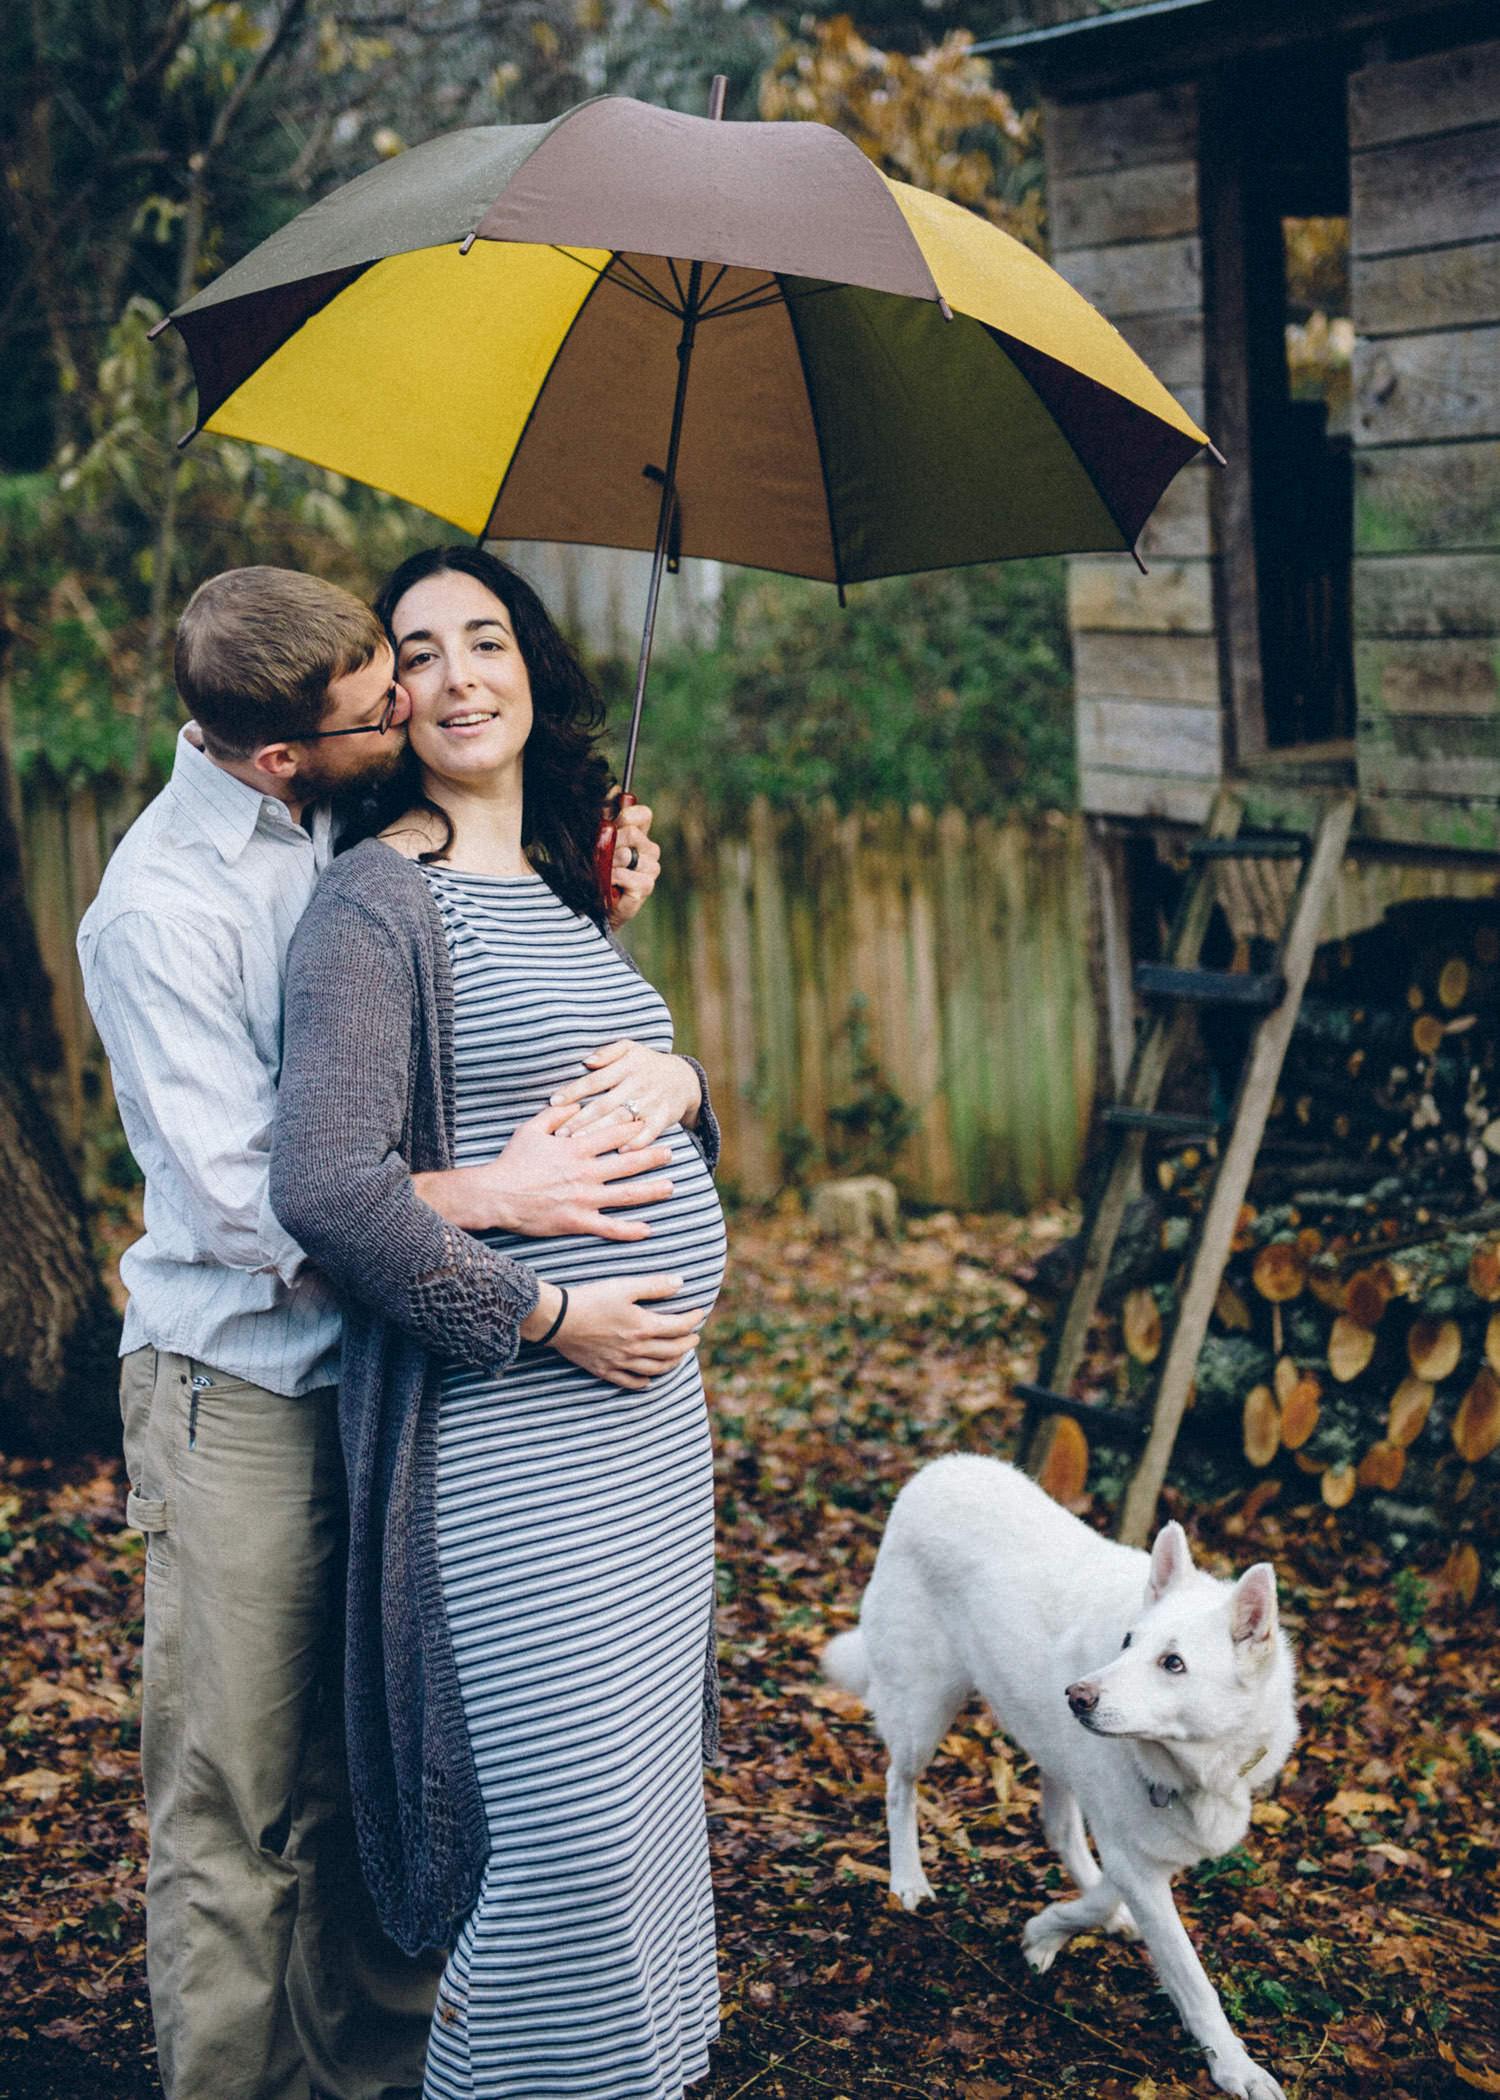 maternityphotography_ashevillenorthcarolina_austendiamondphotography-4